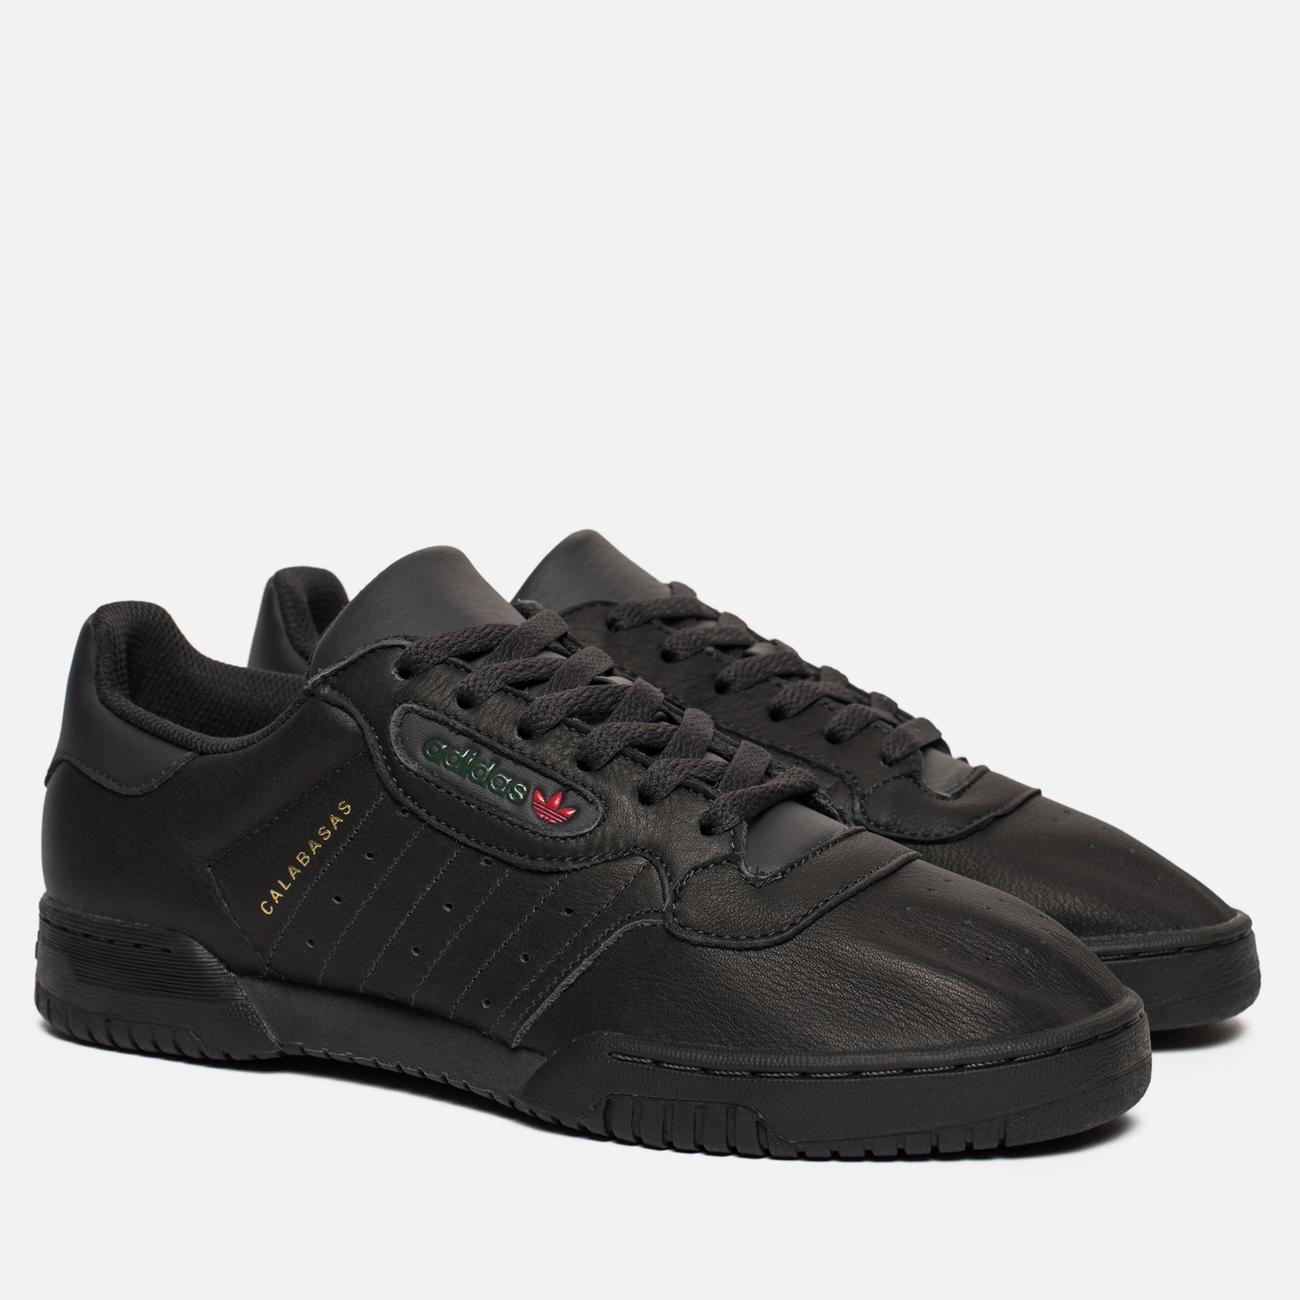 Кроссовки adidas Originals YEEZY Powerphase Black